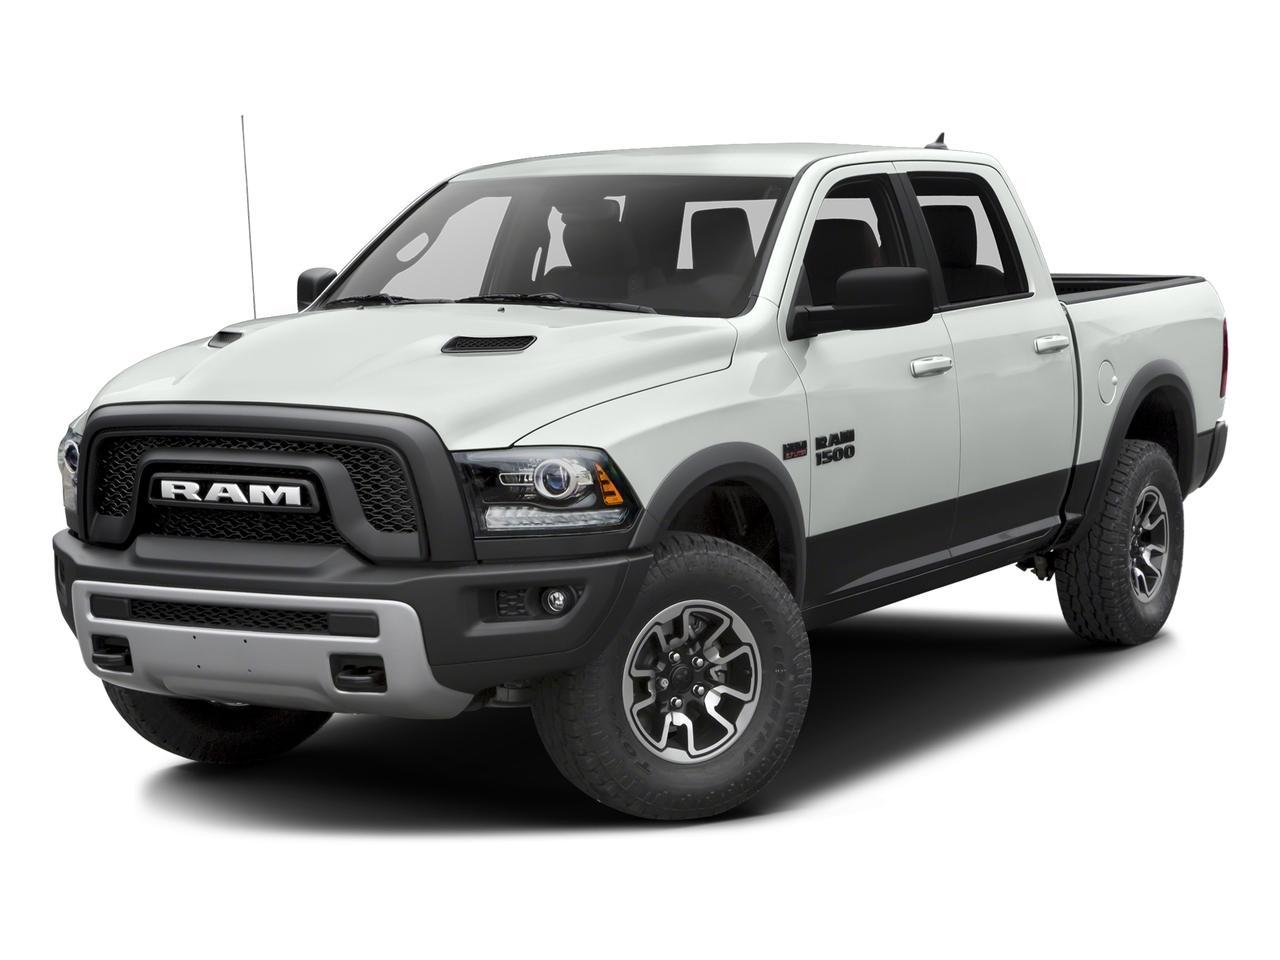 2016 Ram 1500 Vehicle Photo in Denver, CO 80123